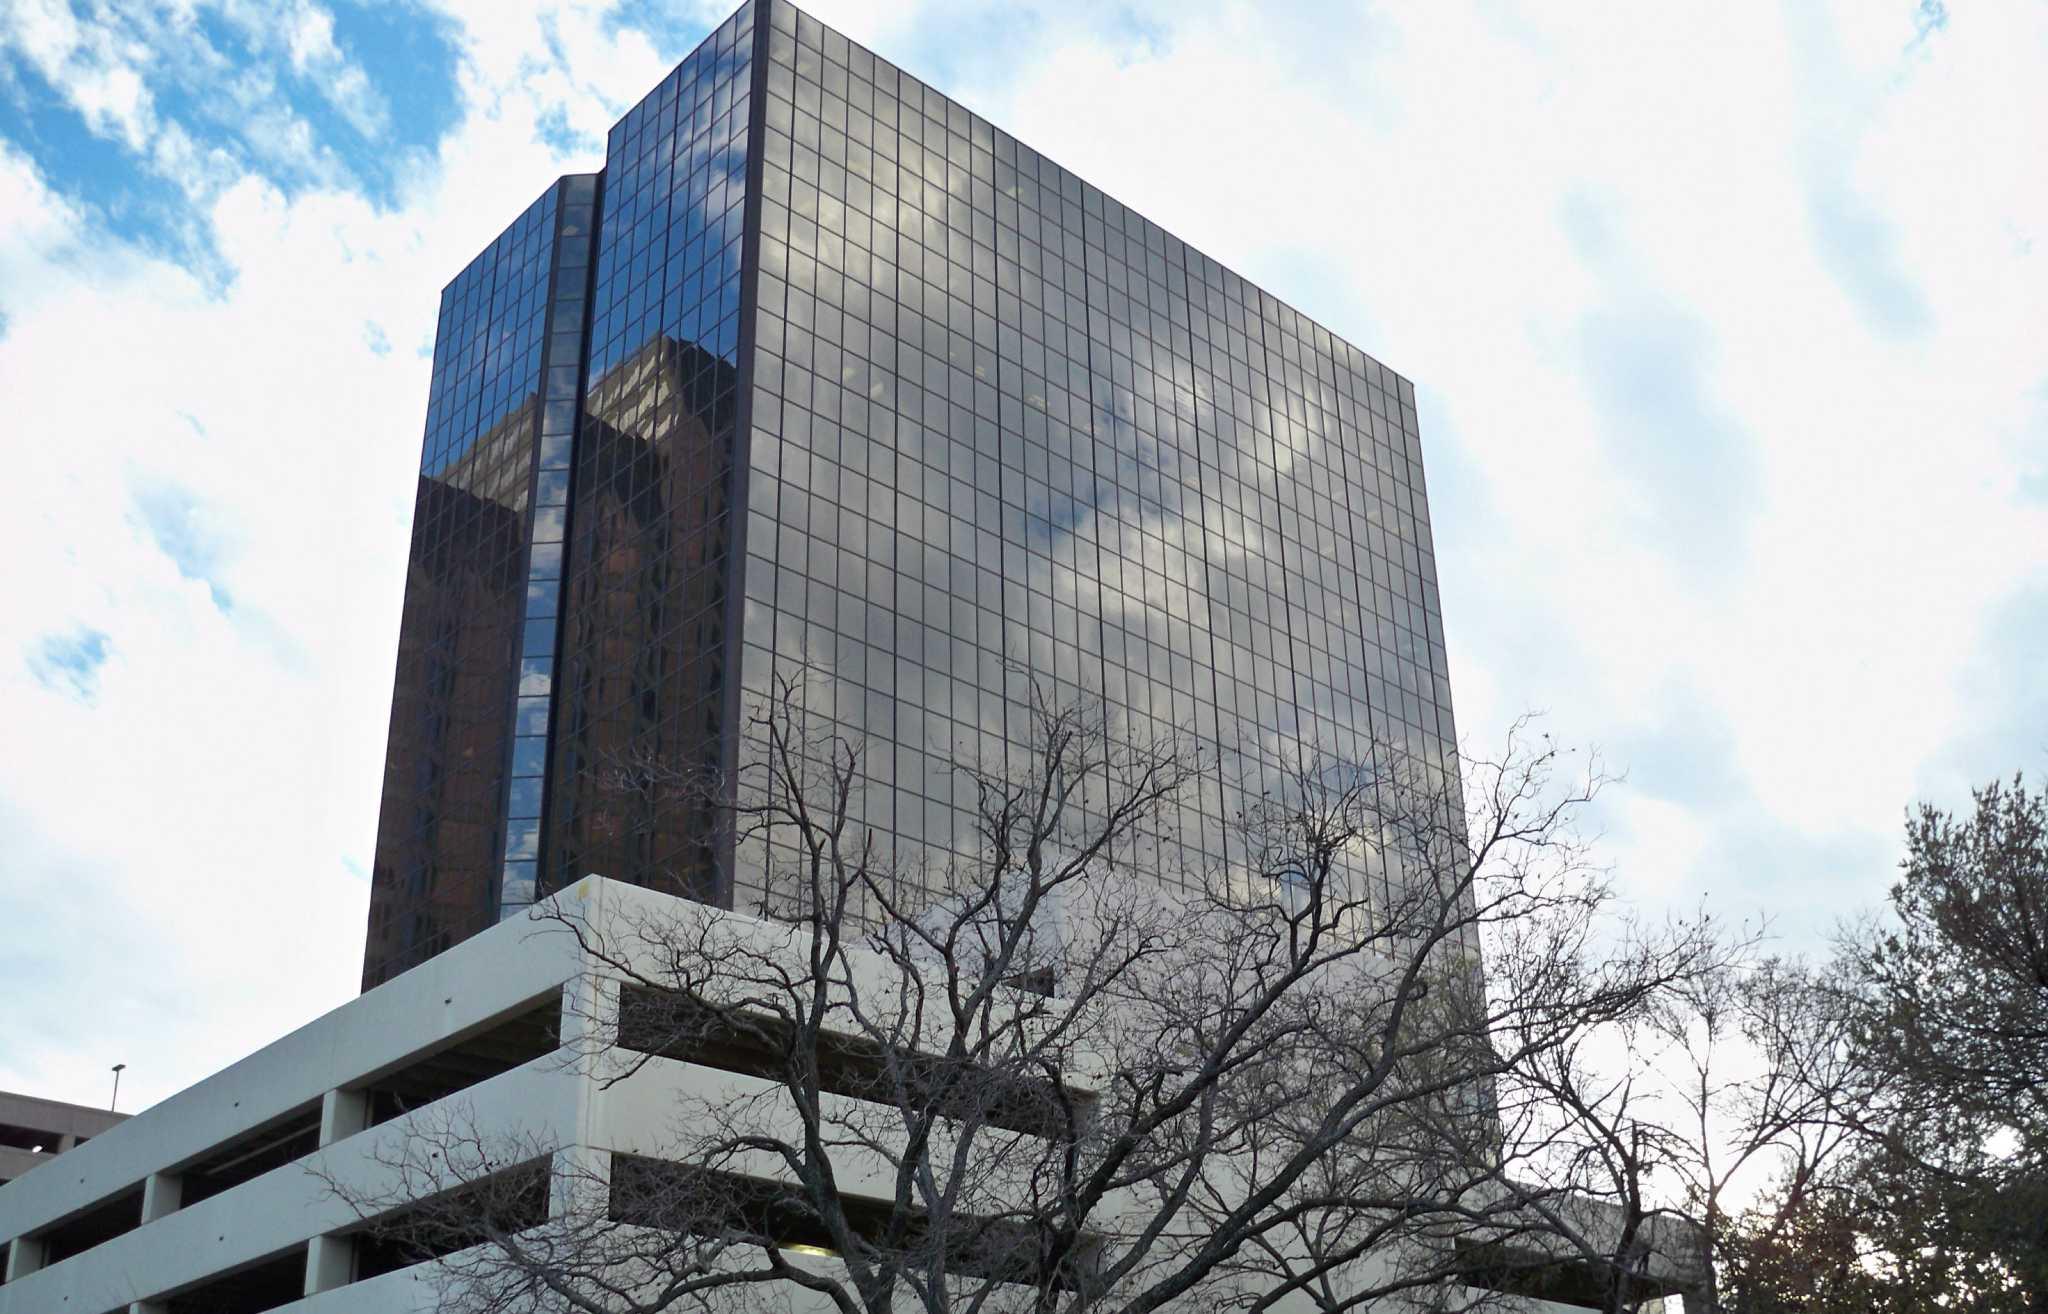 Usaa Moving 150 Jobs Downtown Expressnews Com